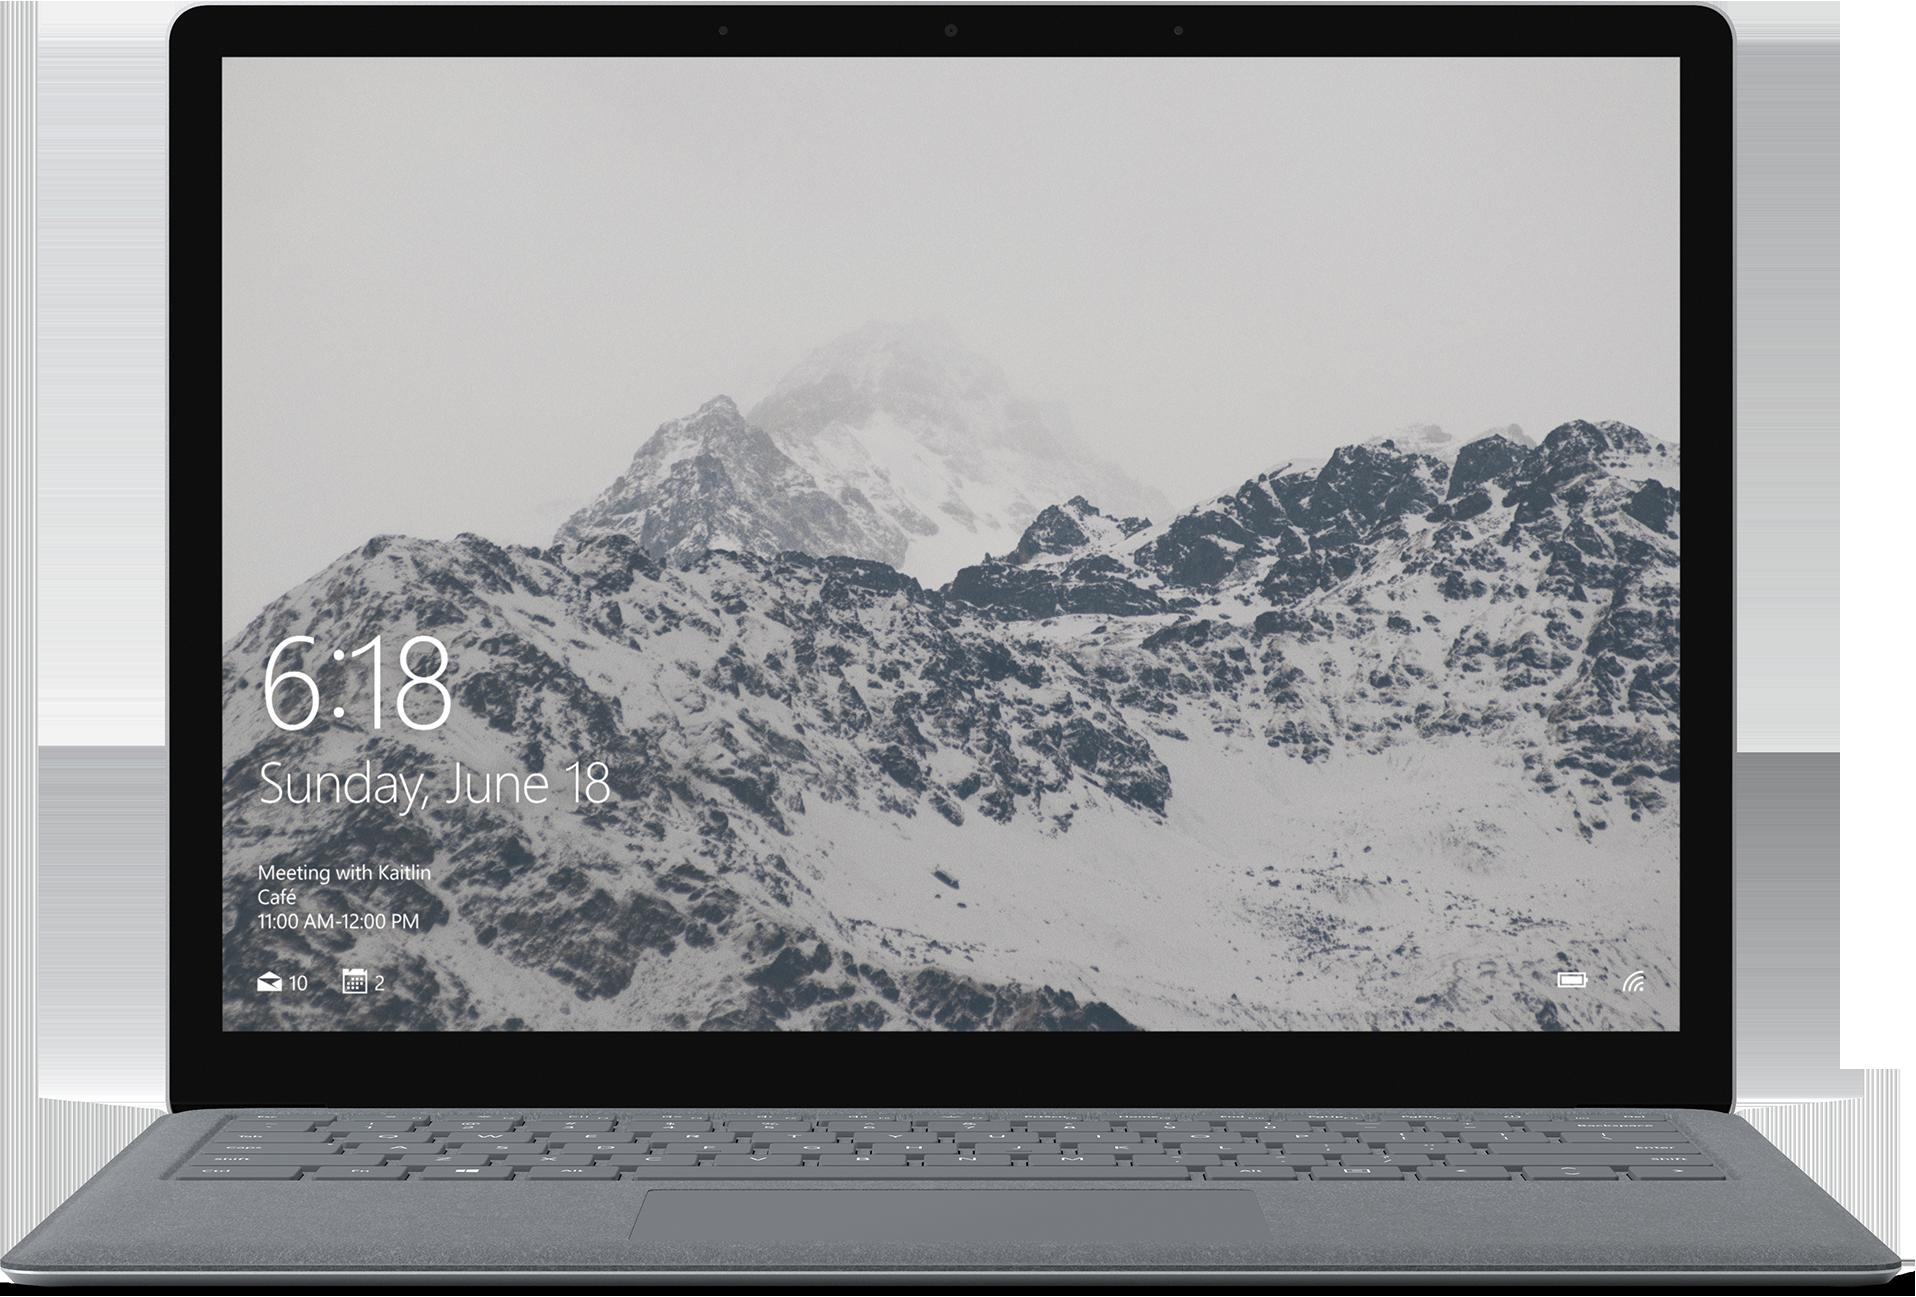 Surface Laptop - 256GB / Intel Core i5 / 8GB RAM (Platinum) - Ships by 8/27/2018